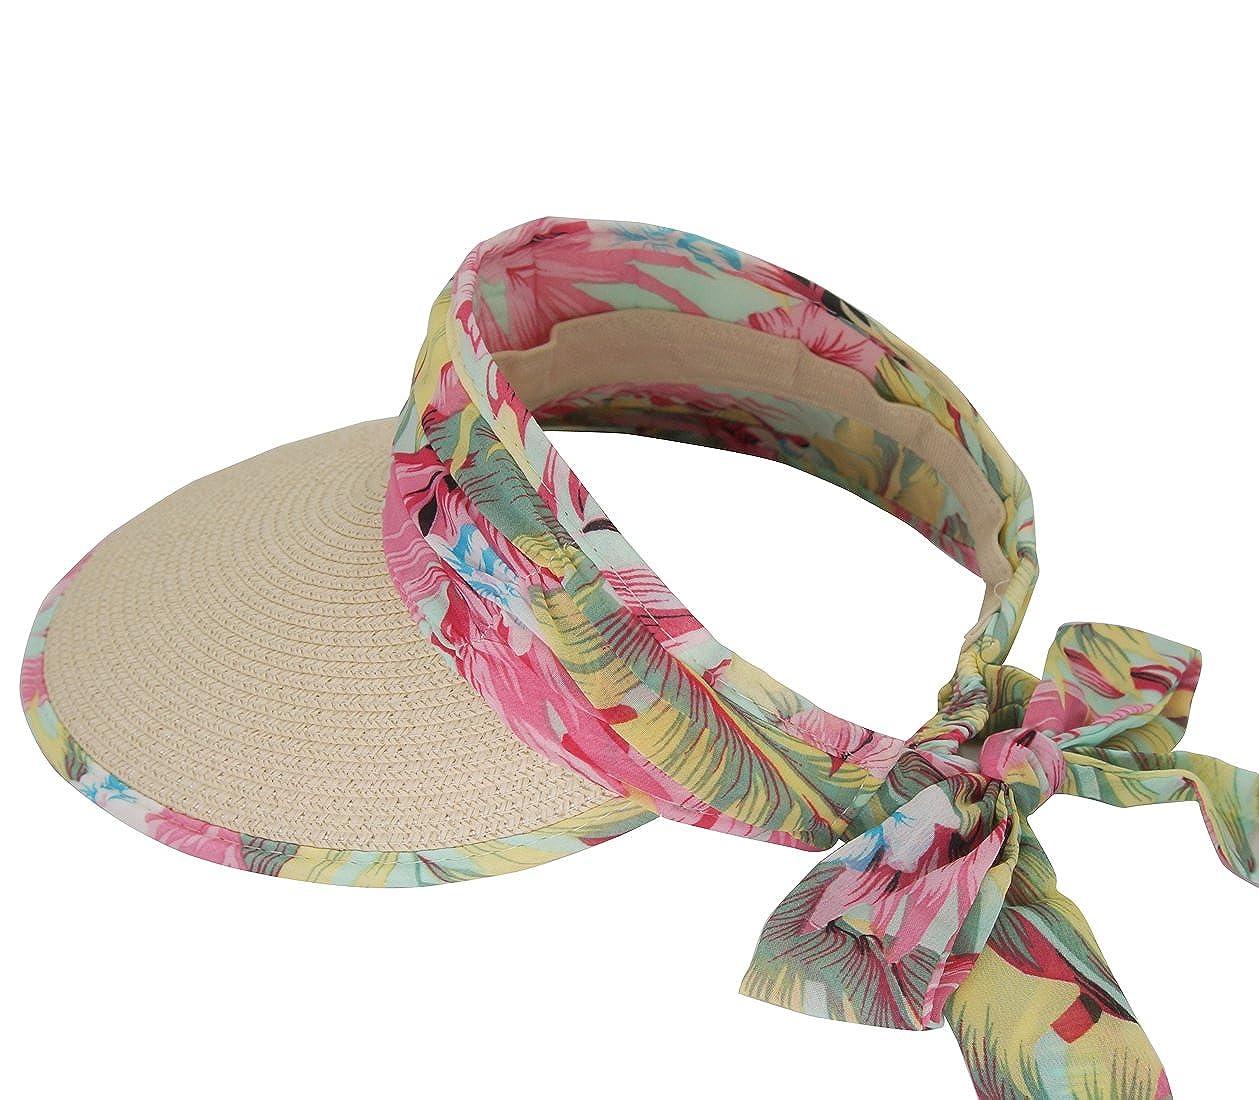 Roffatide Women Floral Print Straw Visor Wide Brim Sun Hat with Bowknot Elegant RT7008-1